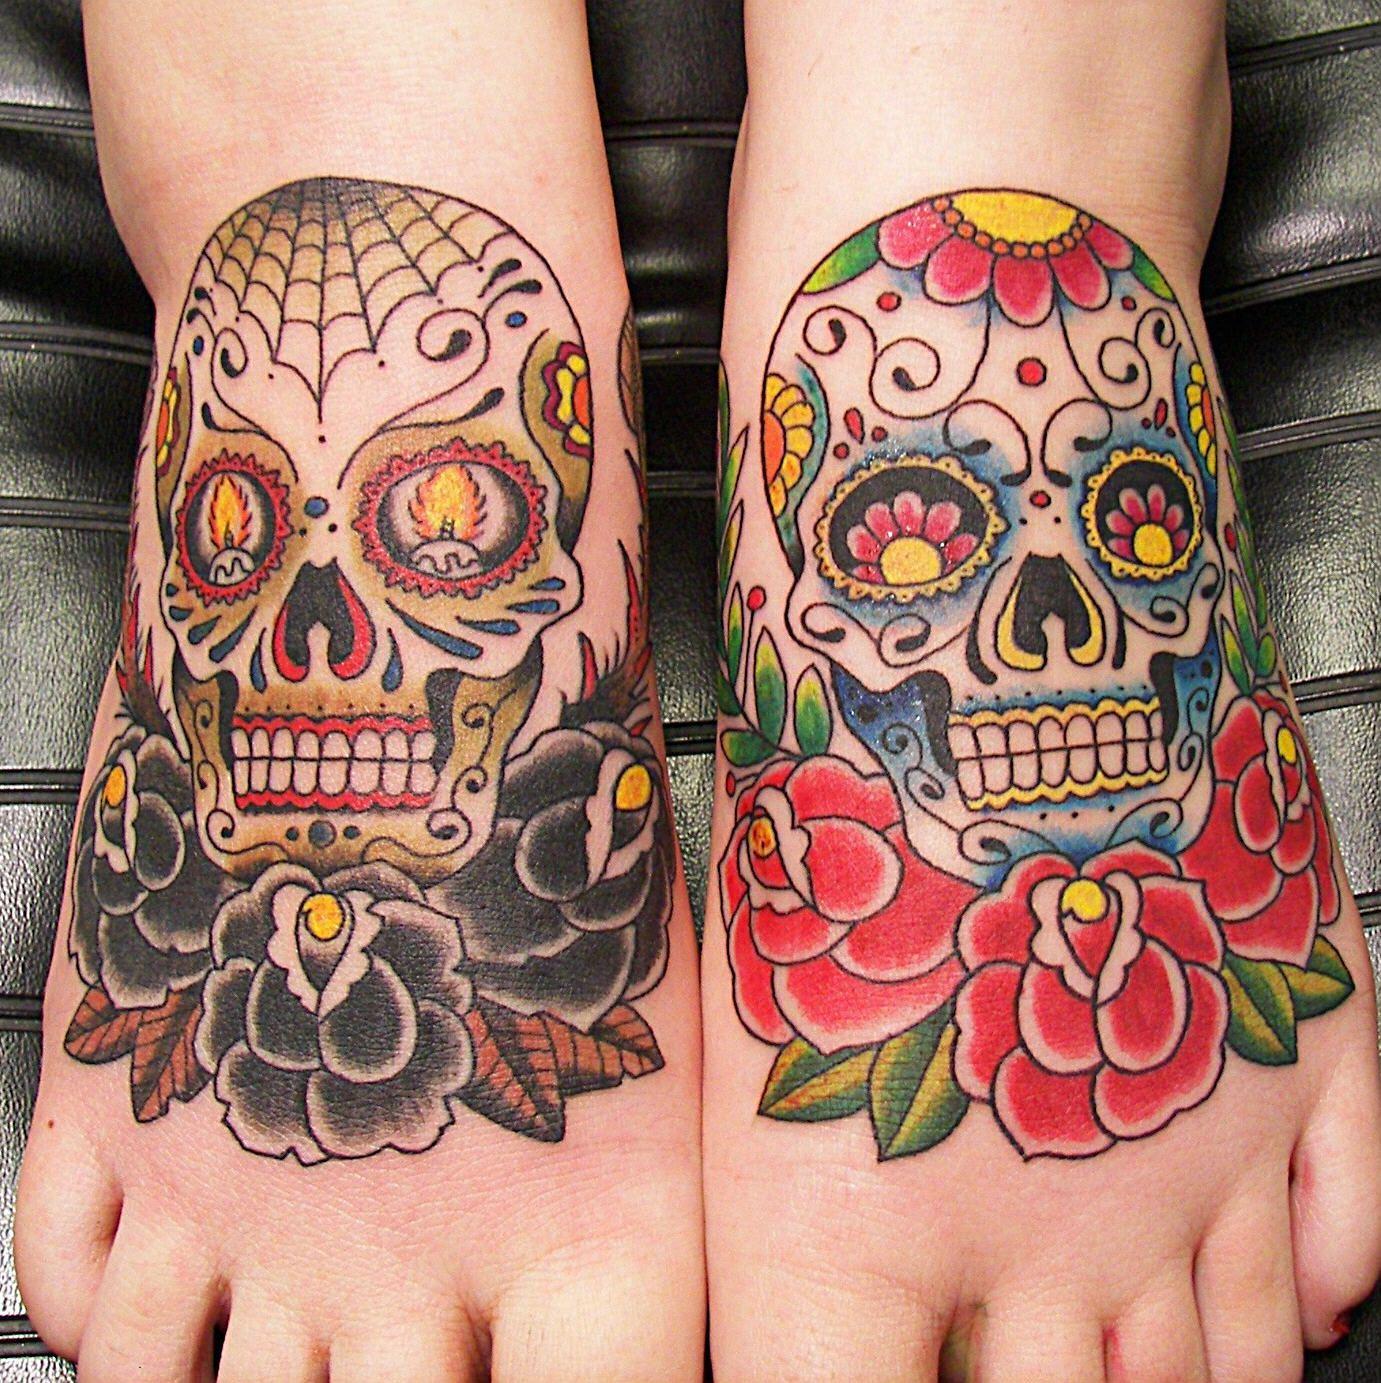 50 meaningful tattoo ideas art and design - 41 Amazing Sugar Skull Tattoos To Celebrate D A De Los Muertos